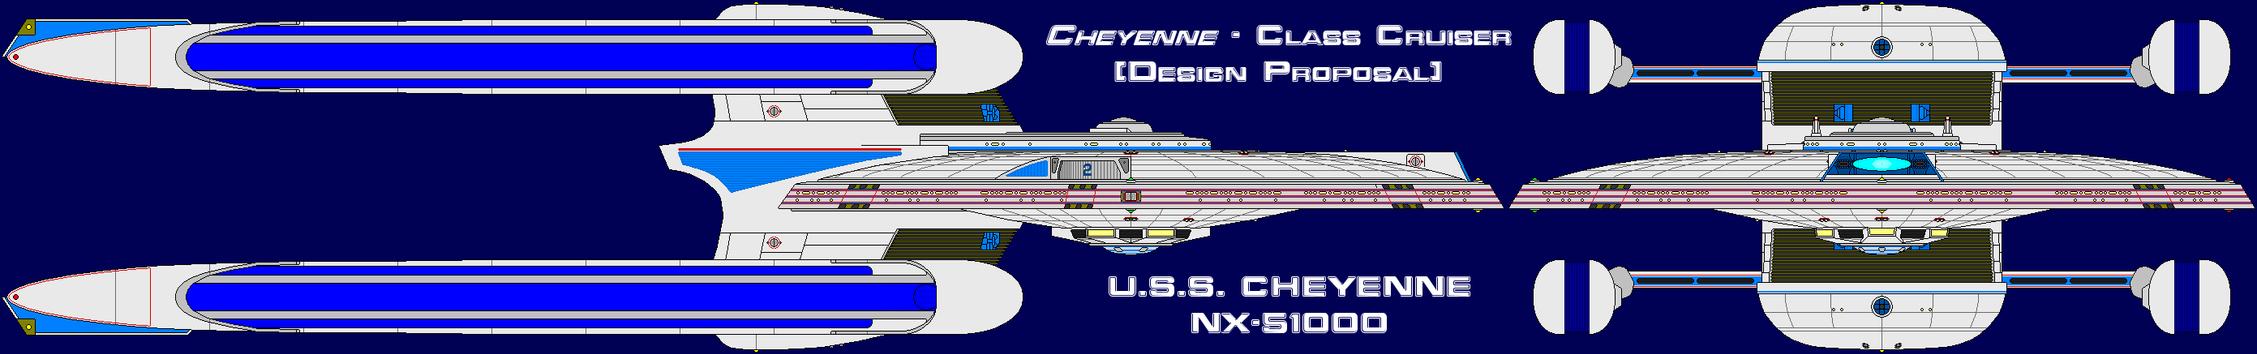 Cheyenne Class Cruiser Design Proposal by MarcusStarkiller